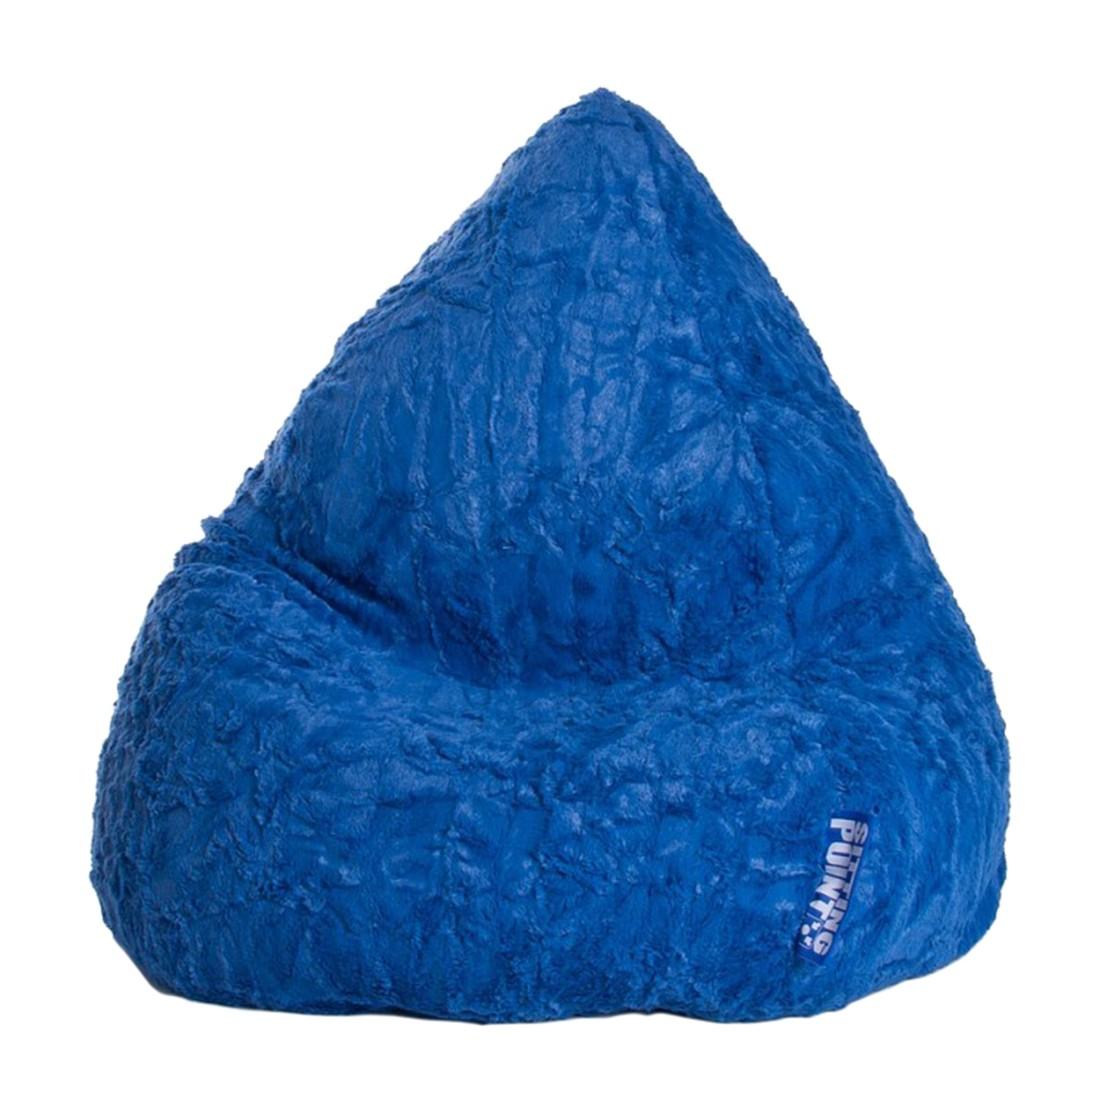 Sitzsack Fluffy XL – Blau, Fredriks bestellen